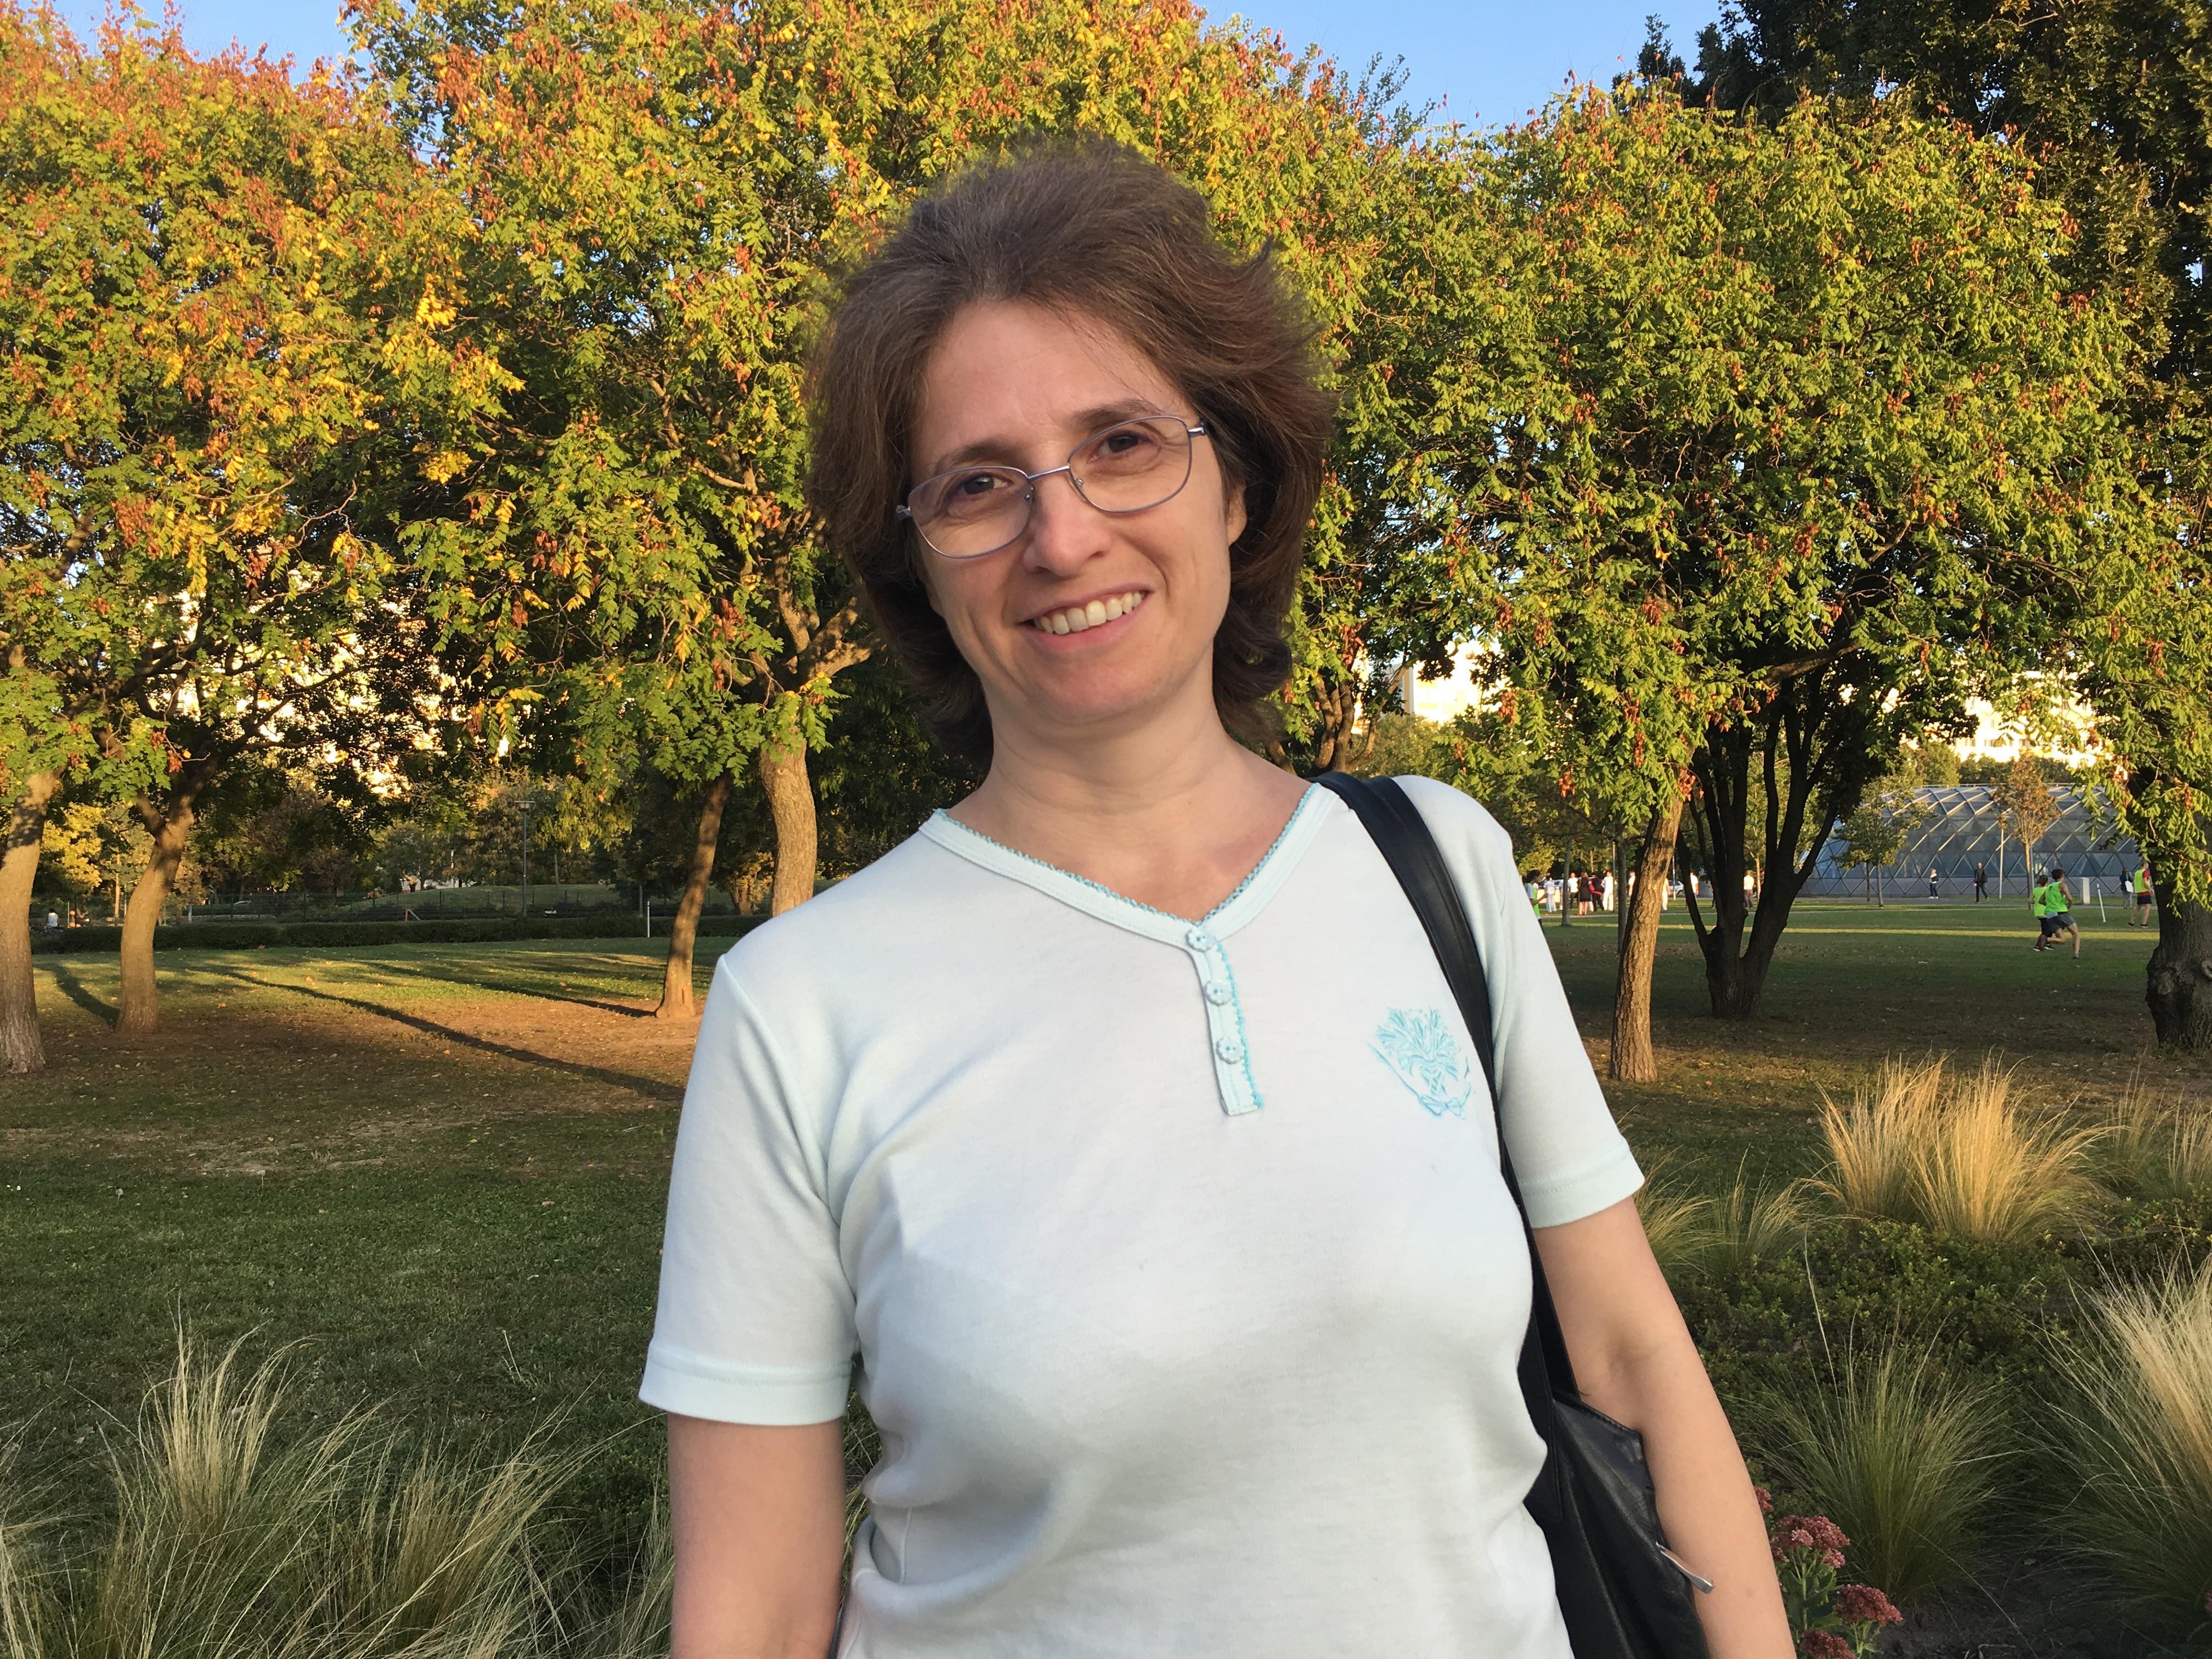 Adrienn, participant of 2019 Budapest pilot